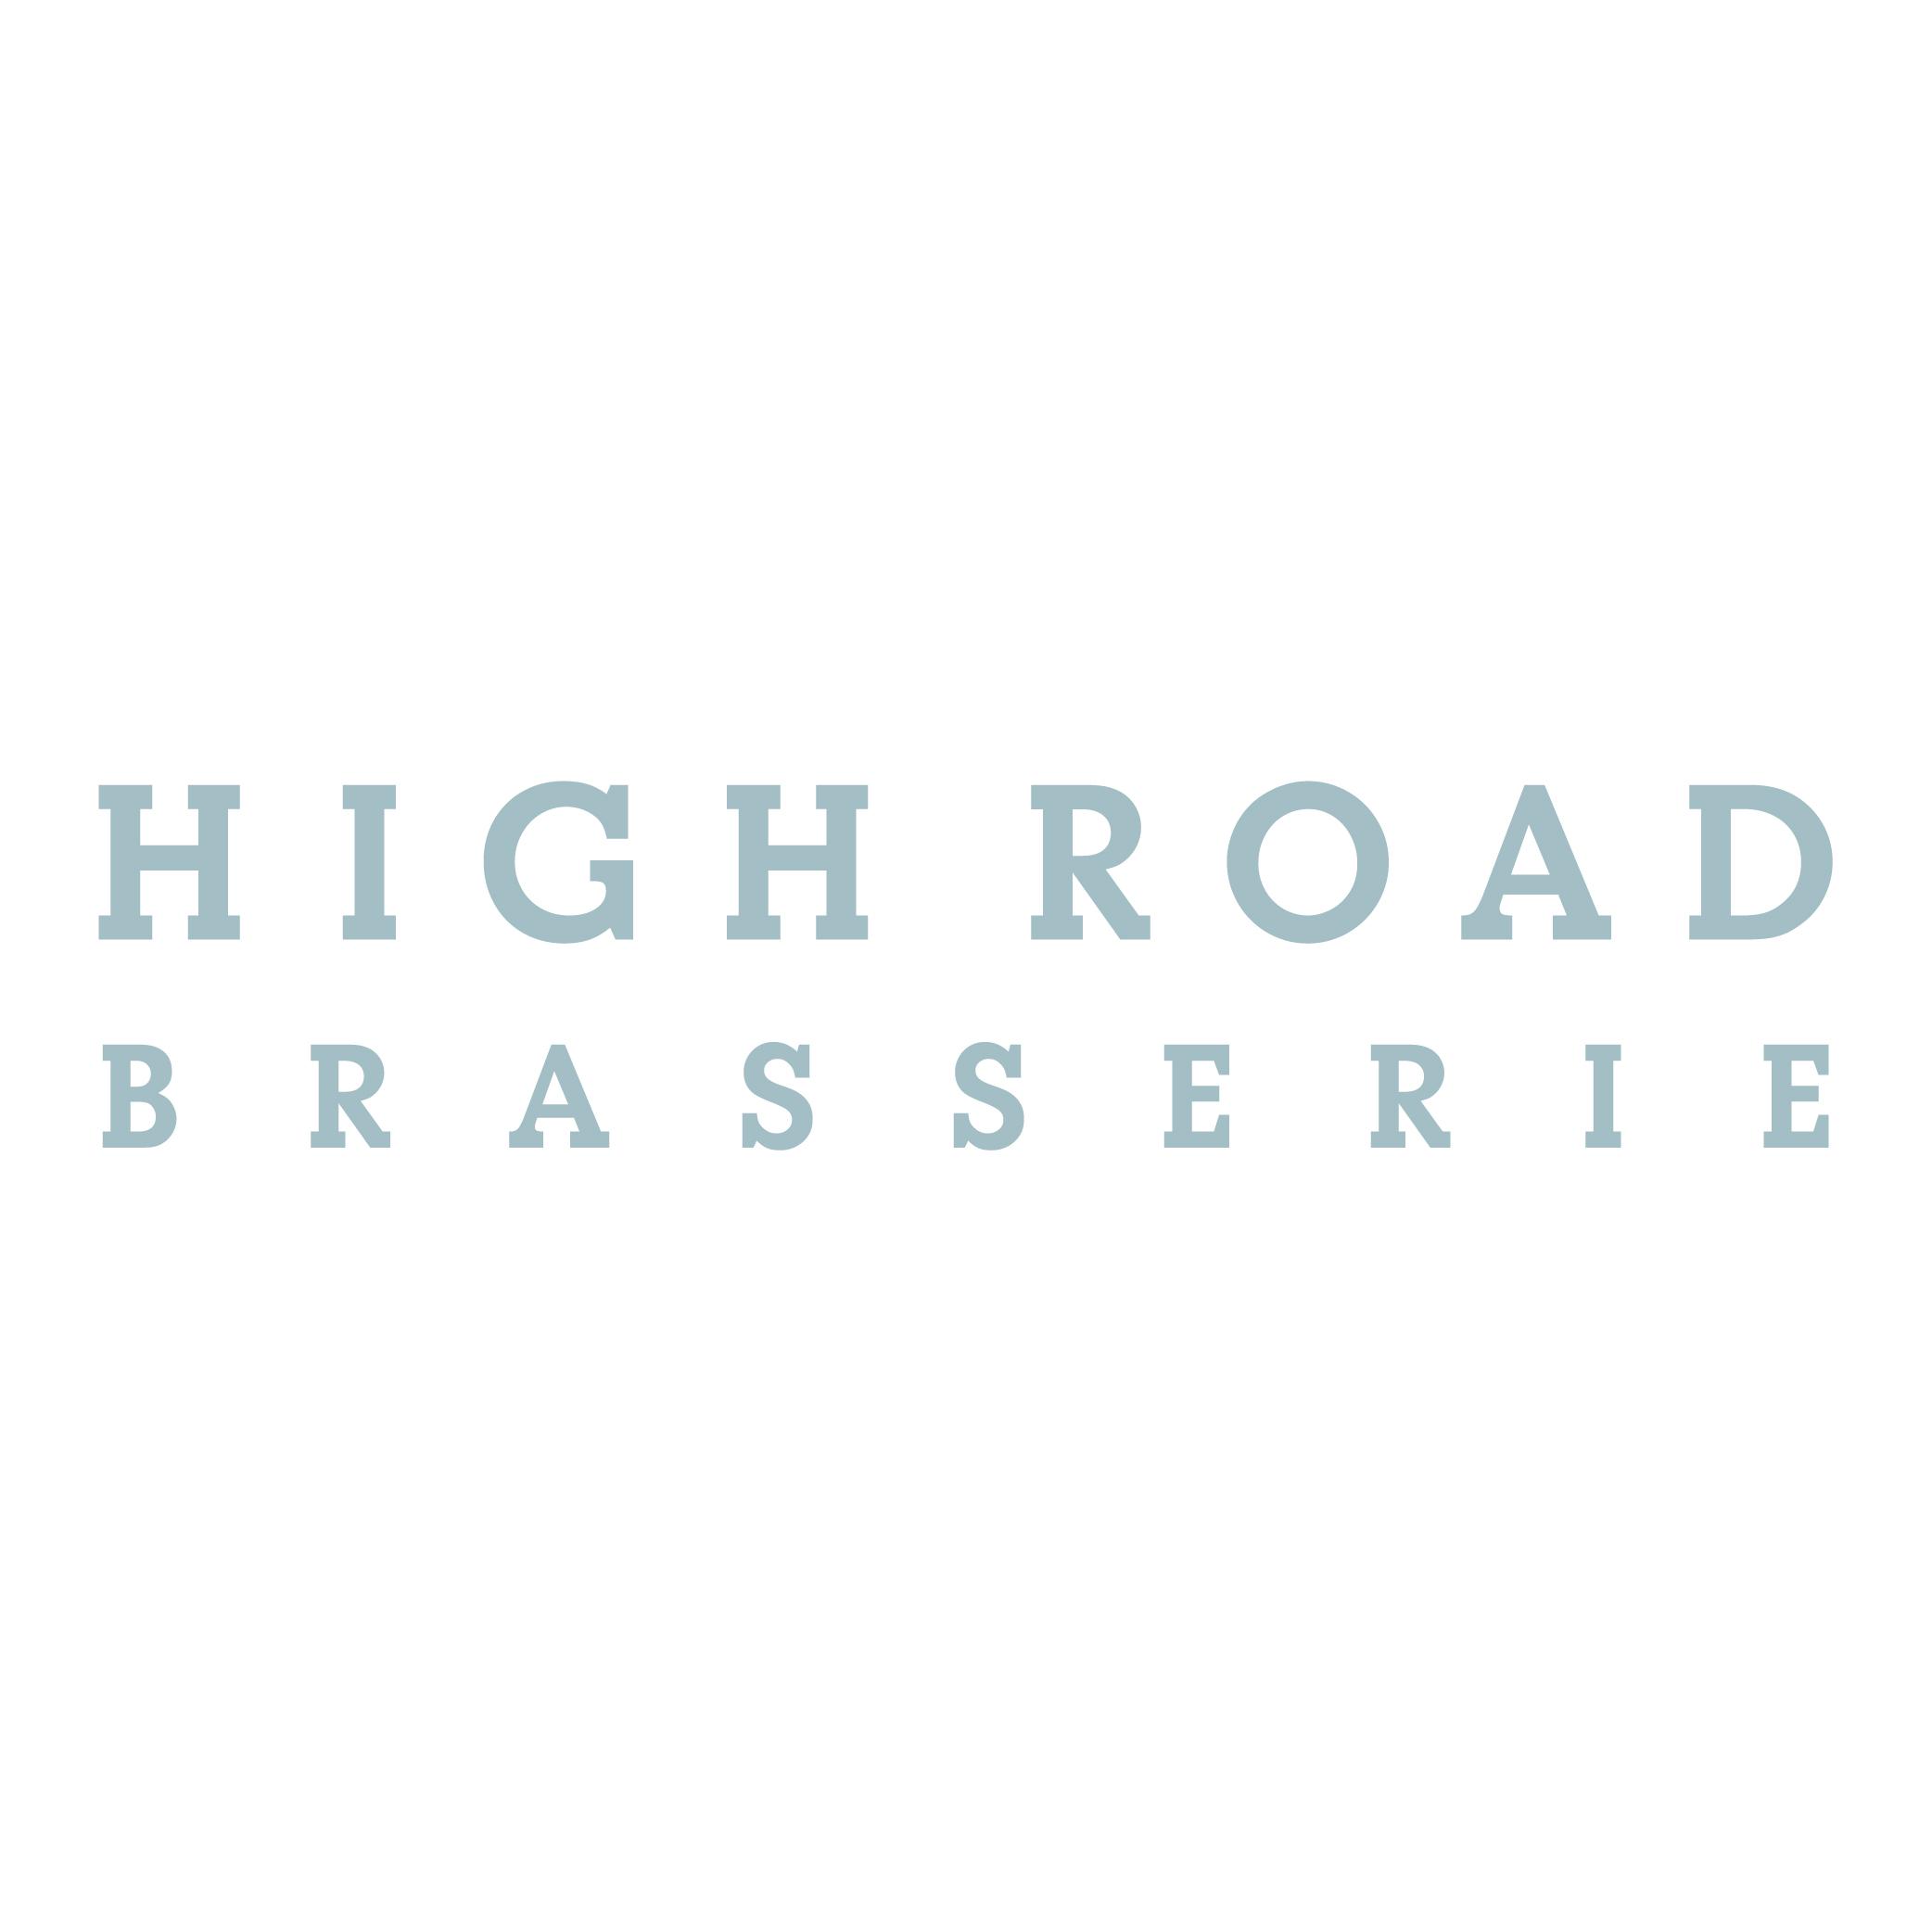 High Road Brasserie